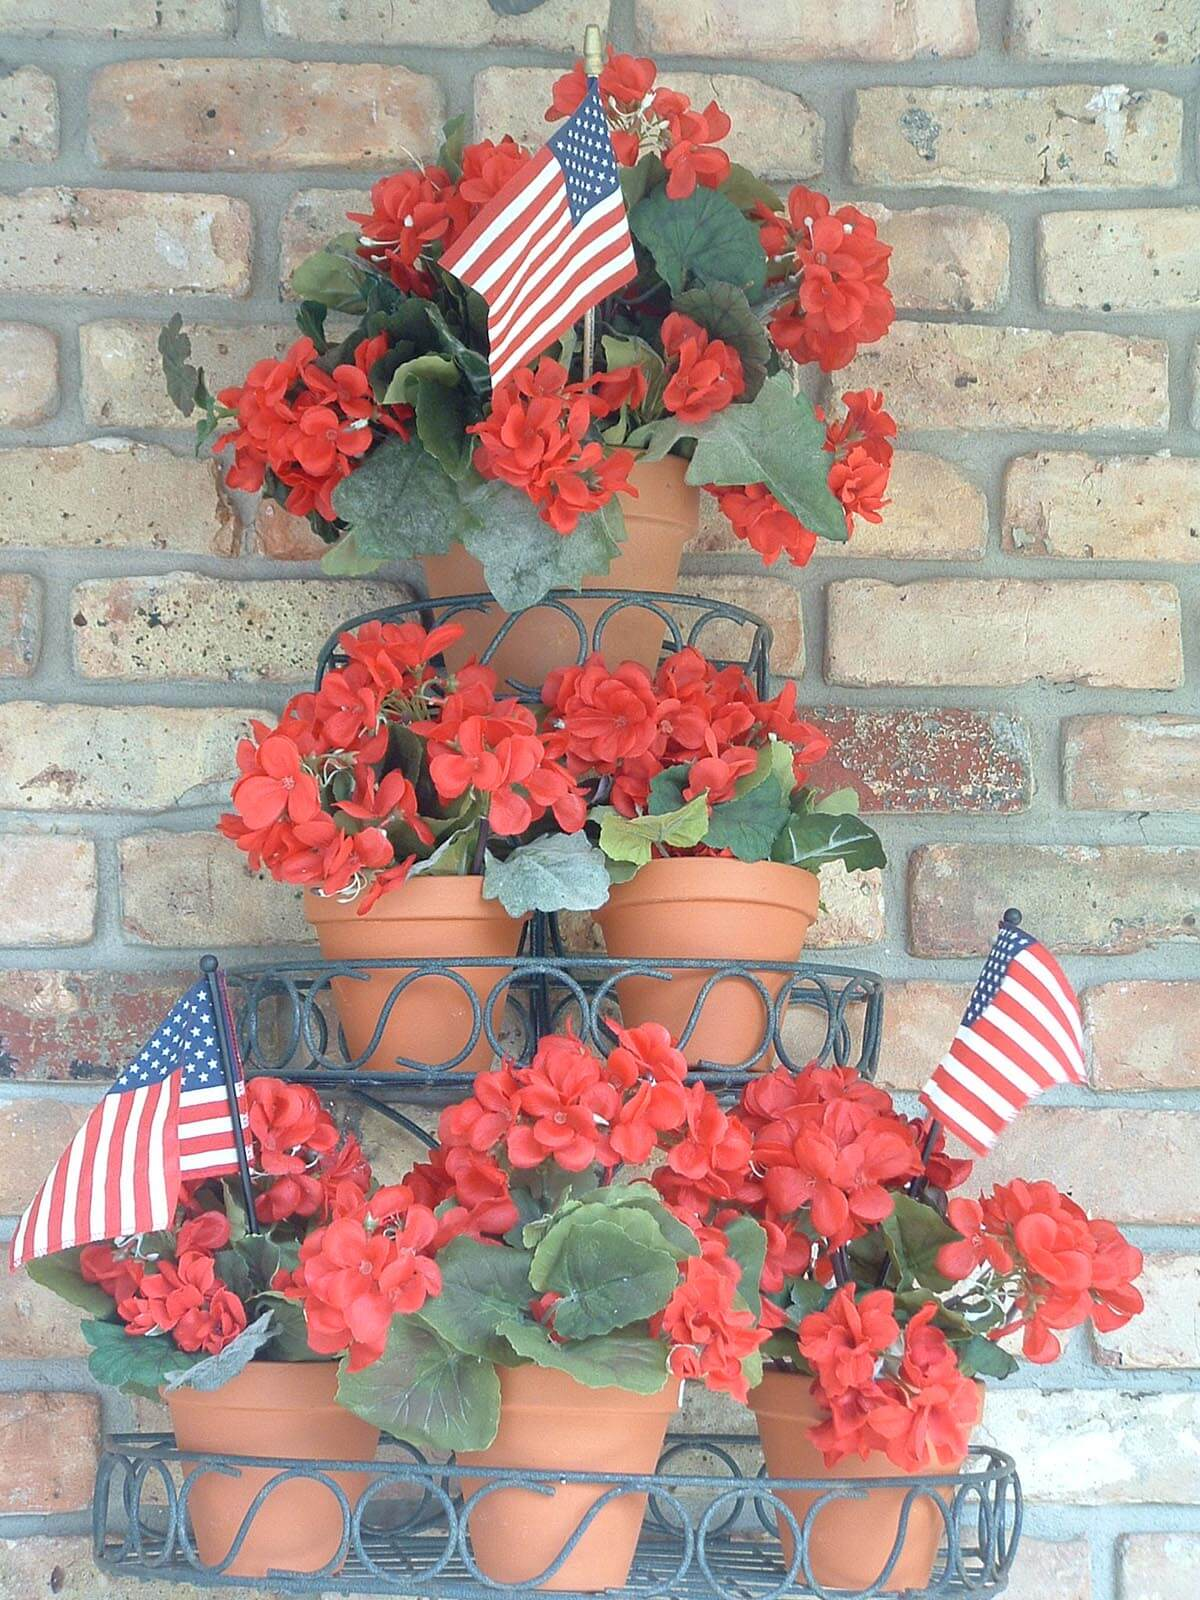 Patriotic Three-Tier Floral Arrangement